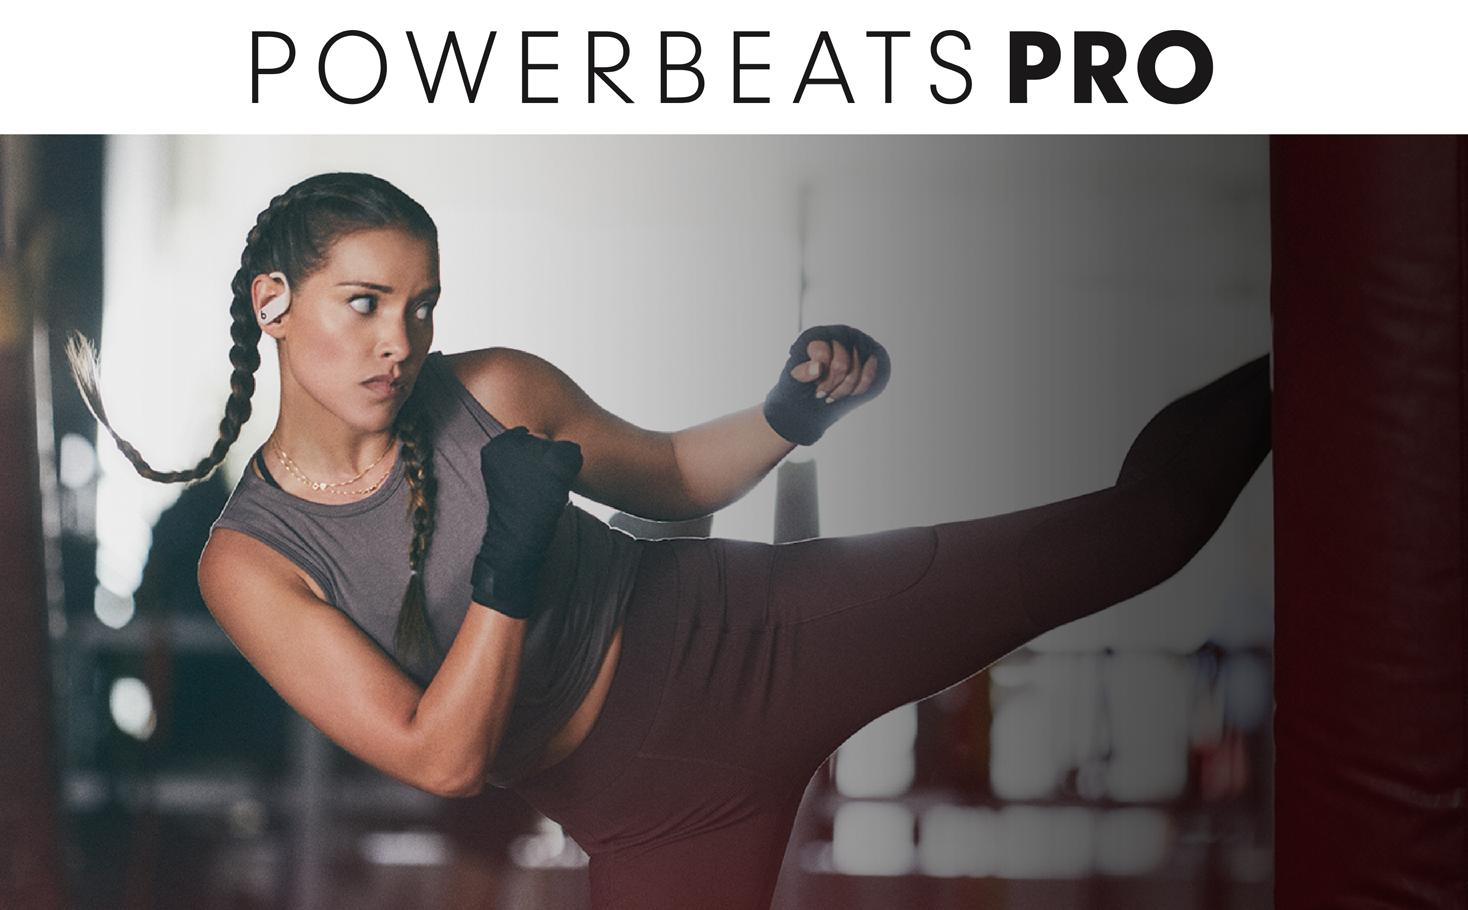 Powerbeats Pro Truly Wireless